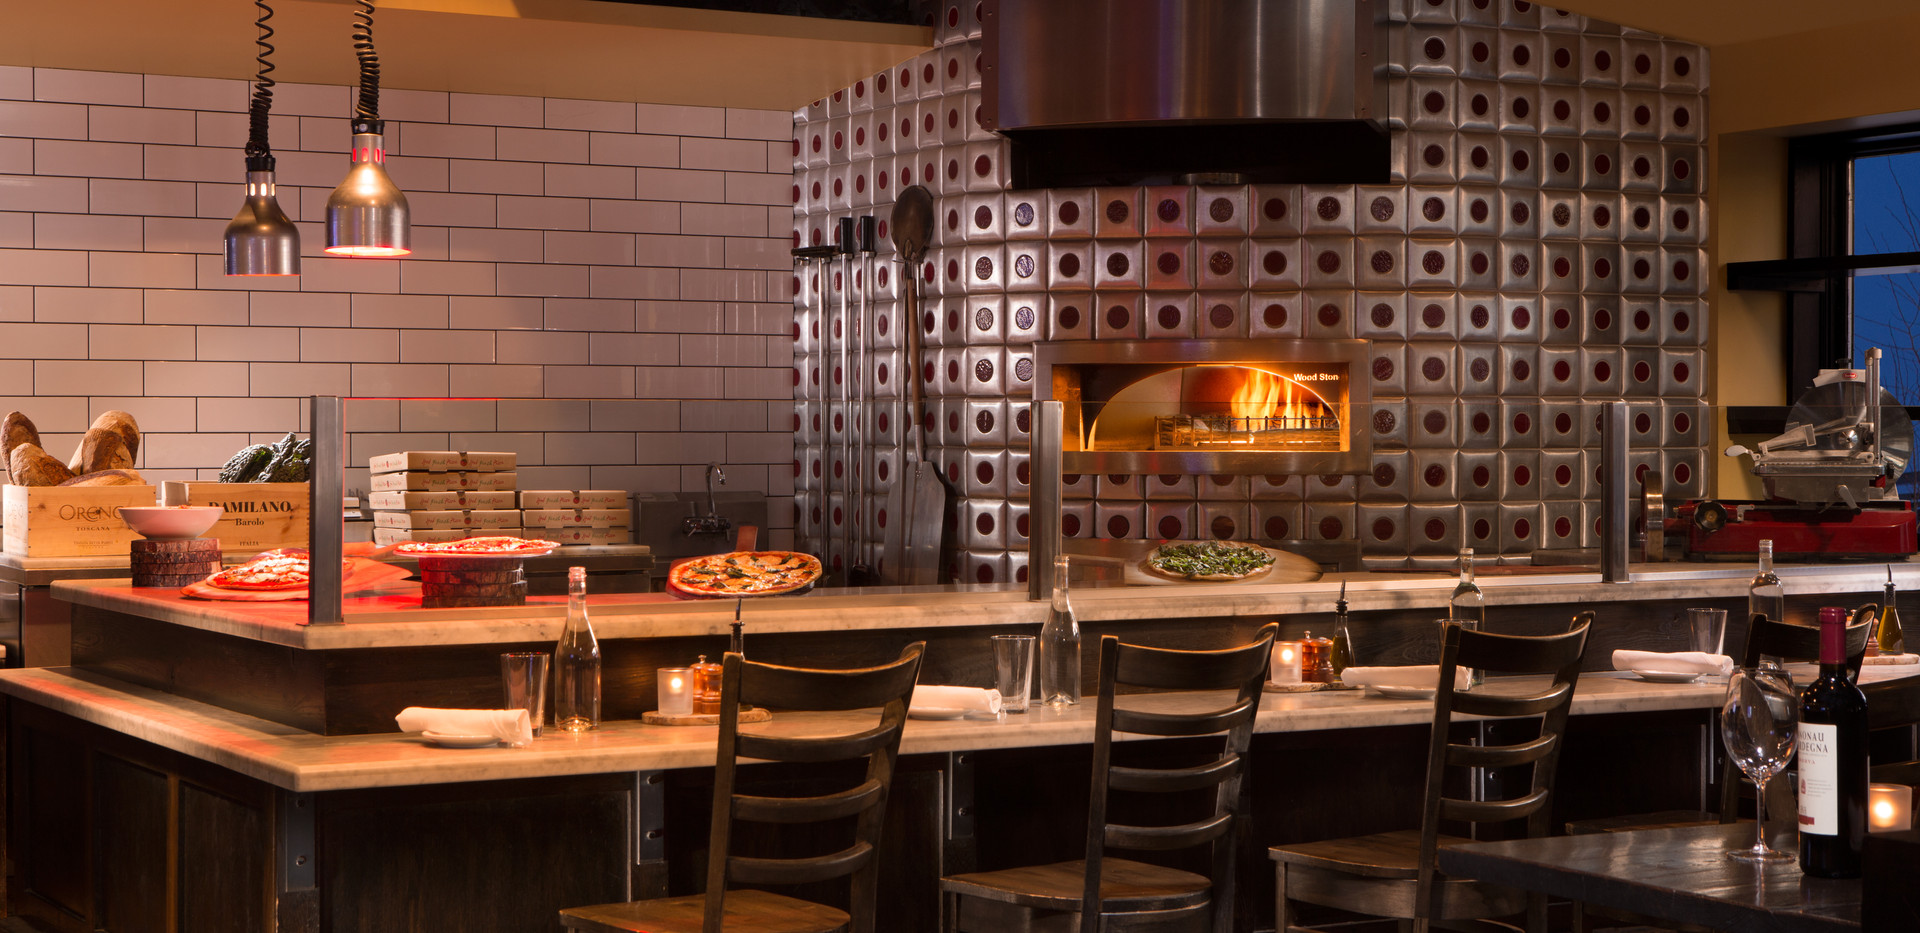 Osteria Pizza Oven.jpg